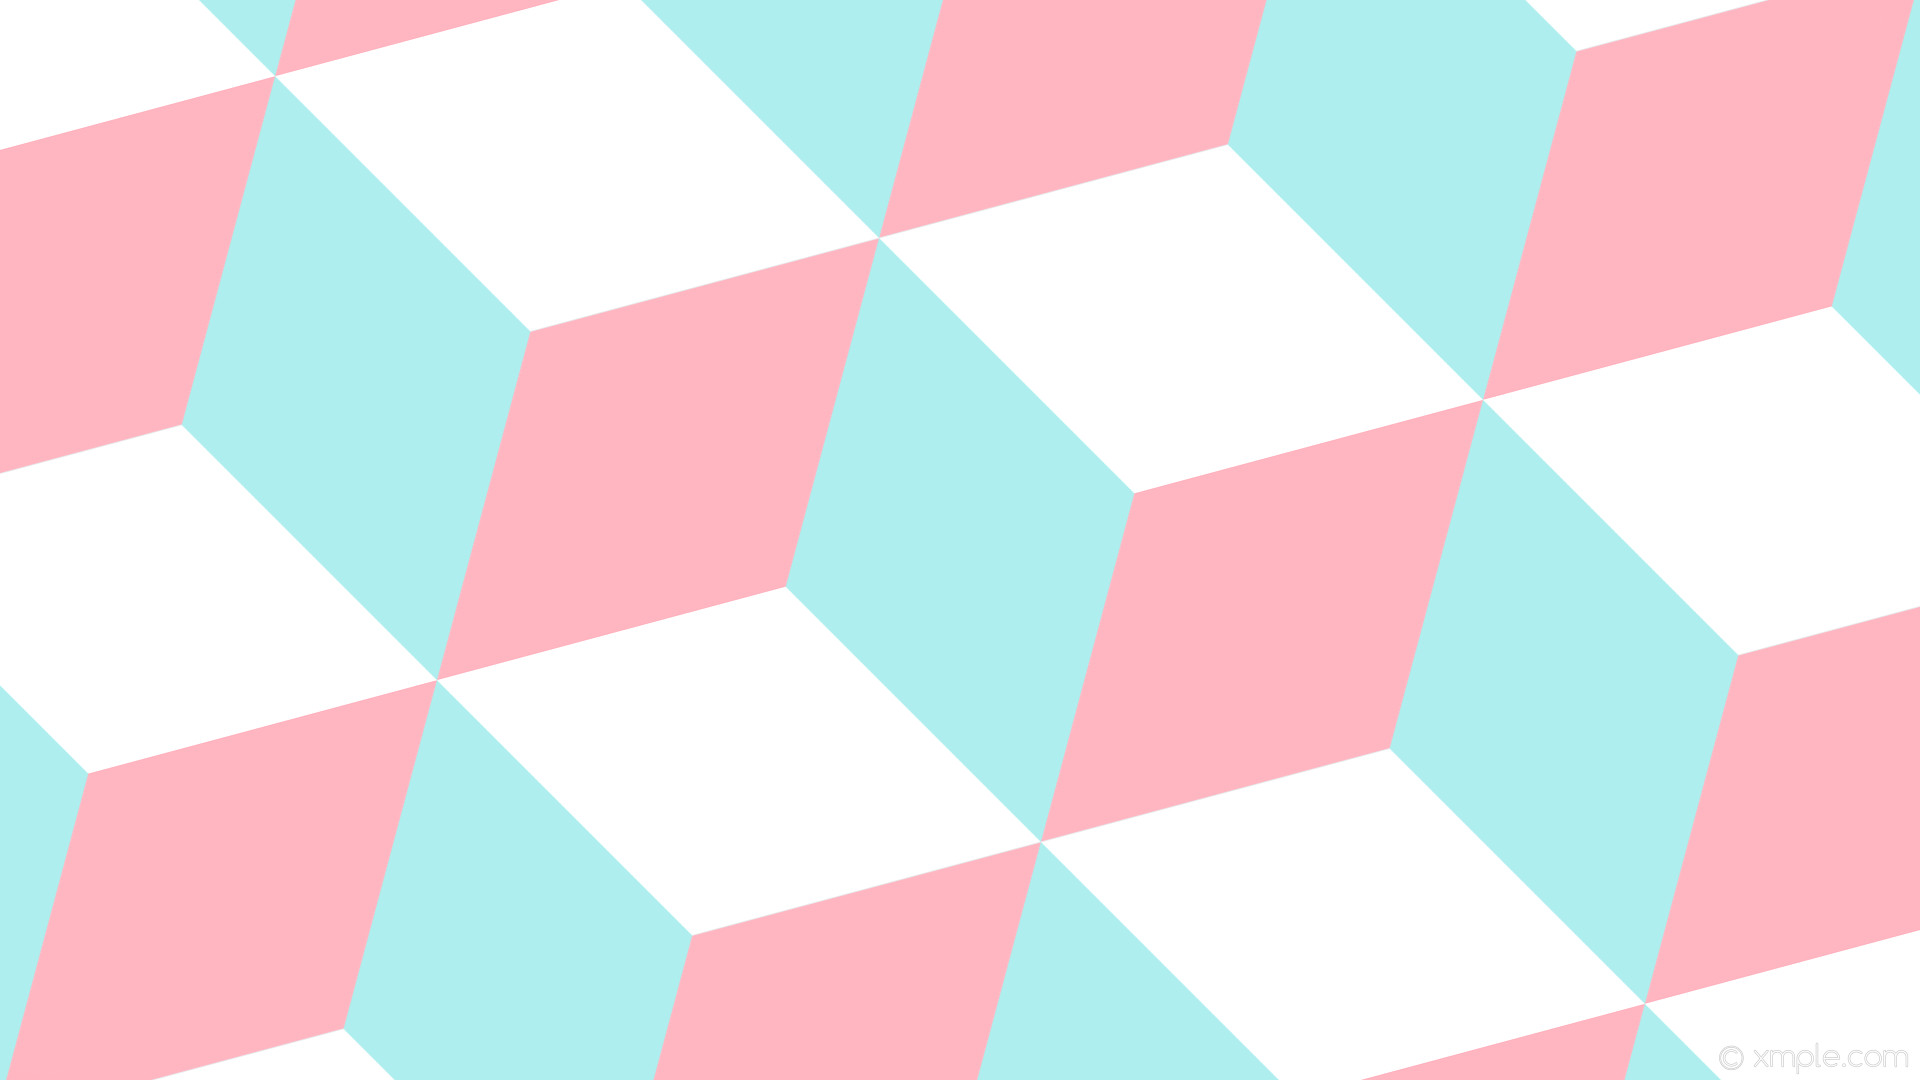 wallpaper 3d cubes blue white pink pale turquoise light pink #afeeee  #ffb6c1 #ffffff